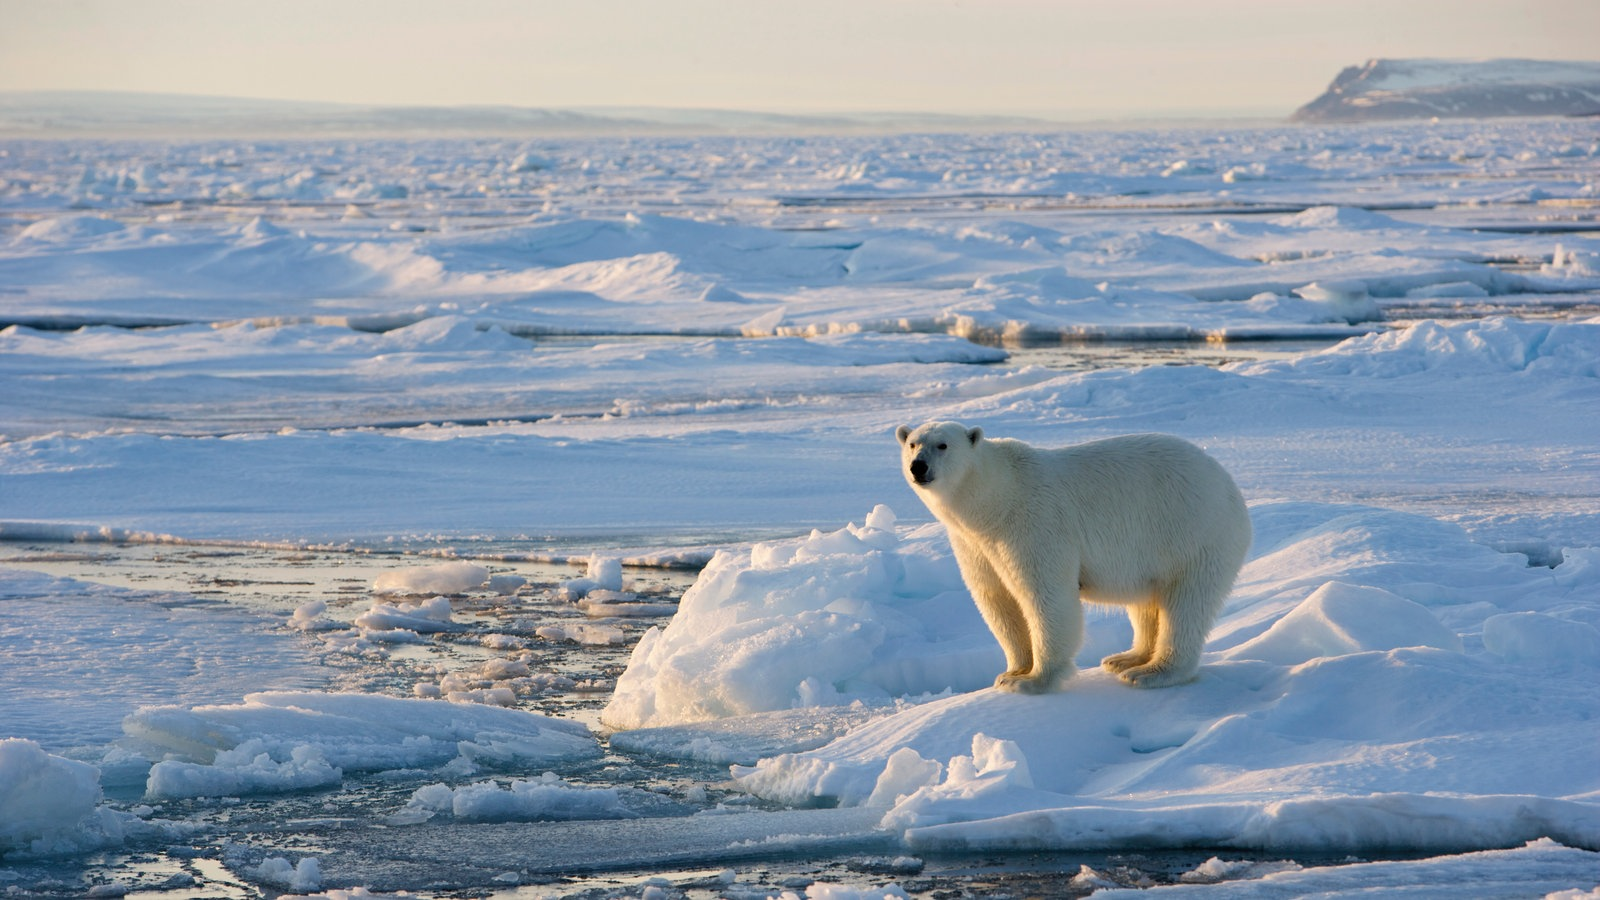 arktis spitzbergen polarregionen natur planet wissen. Black Bedroom Furniture Sets. Home Design Ideas